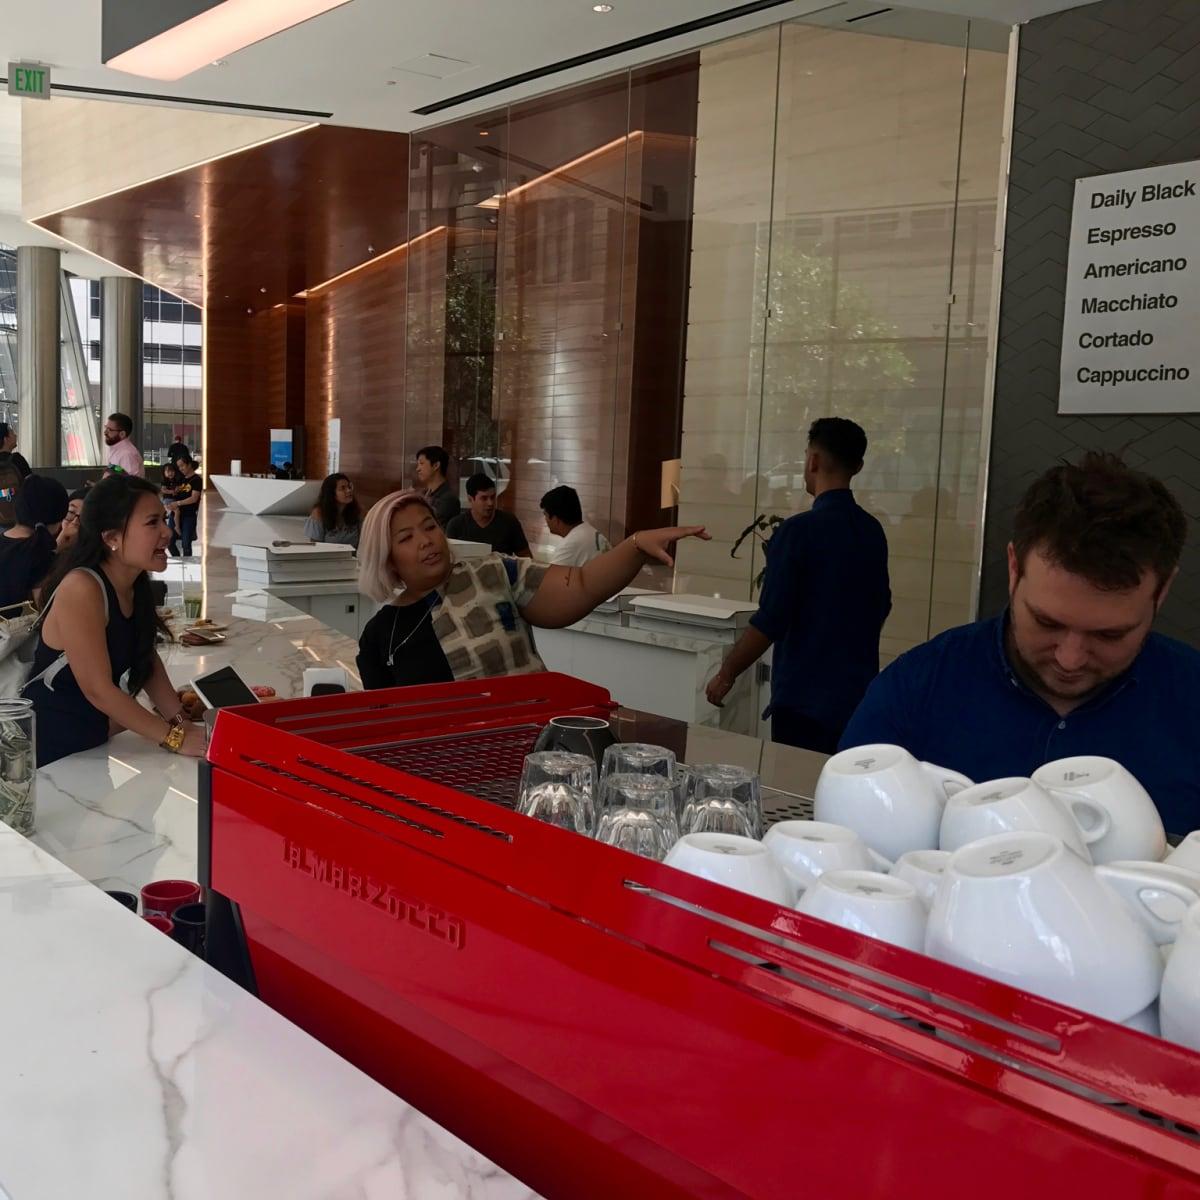 Prelude Coffee counter